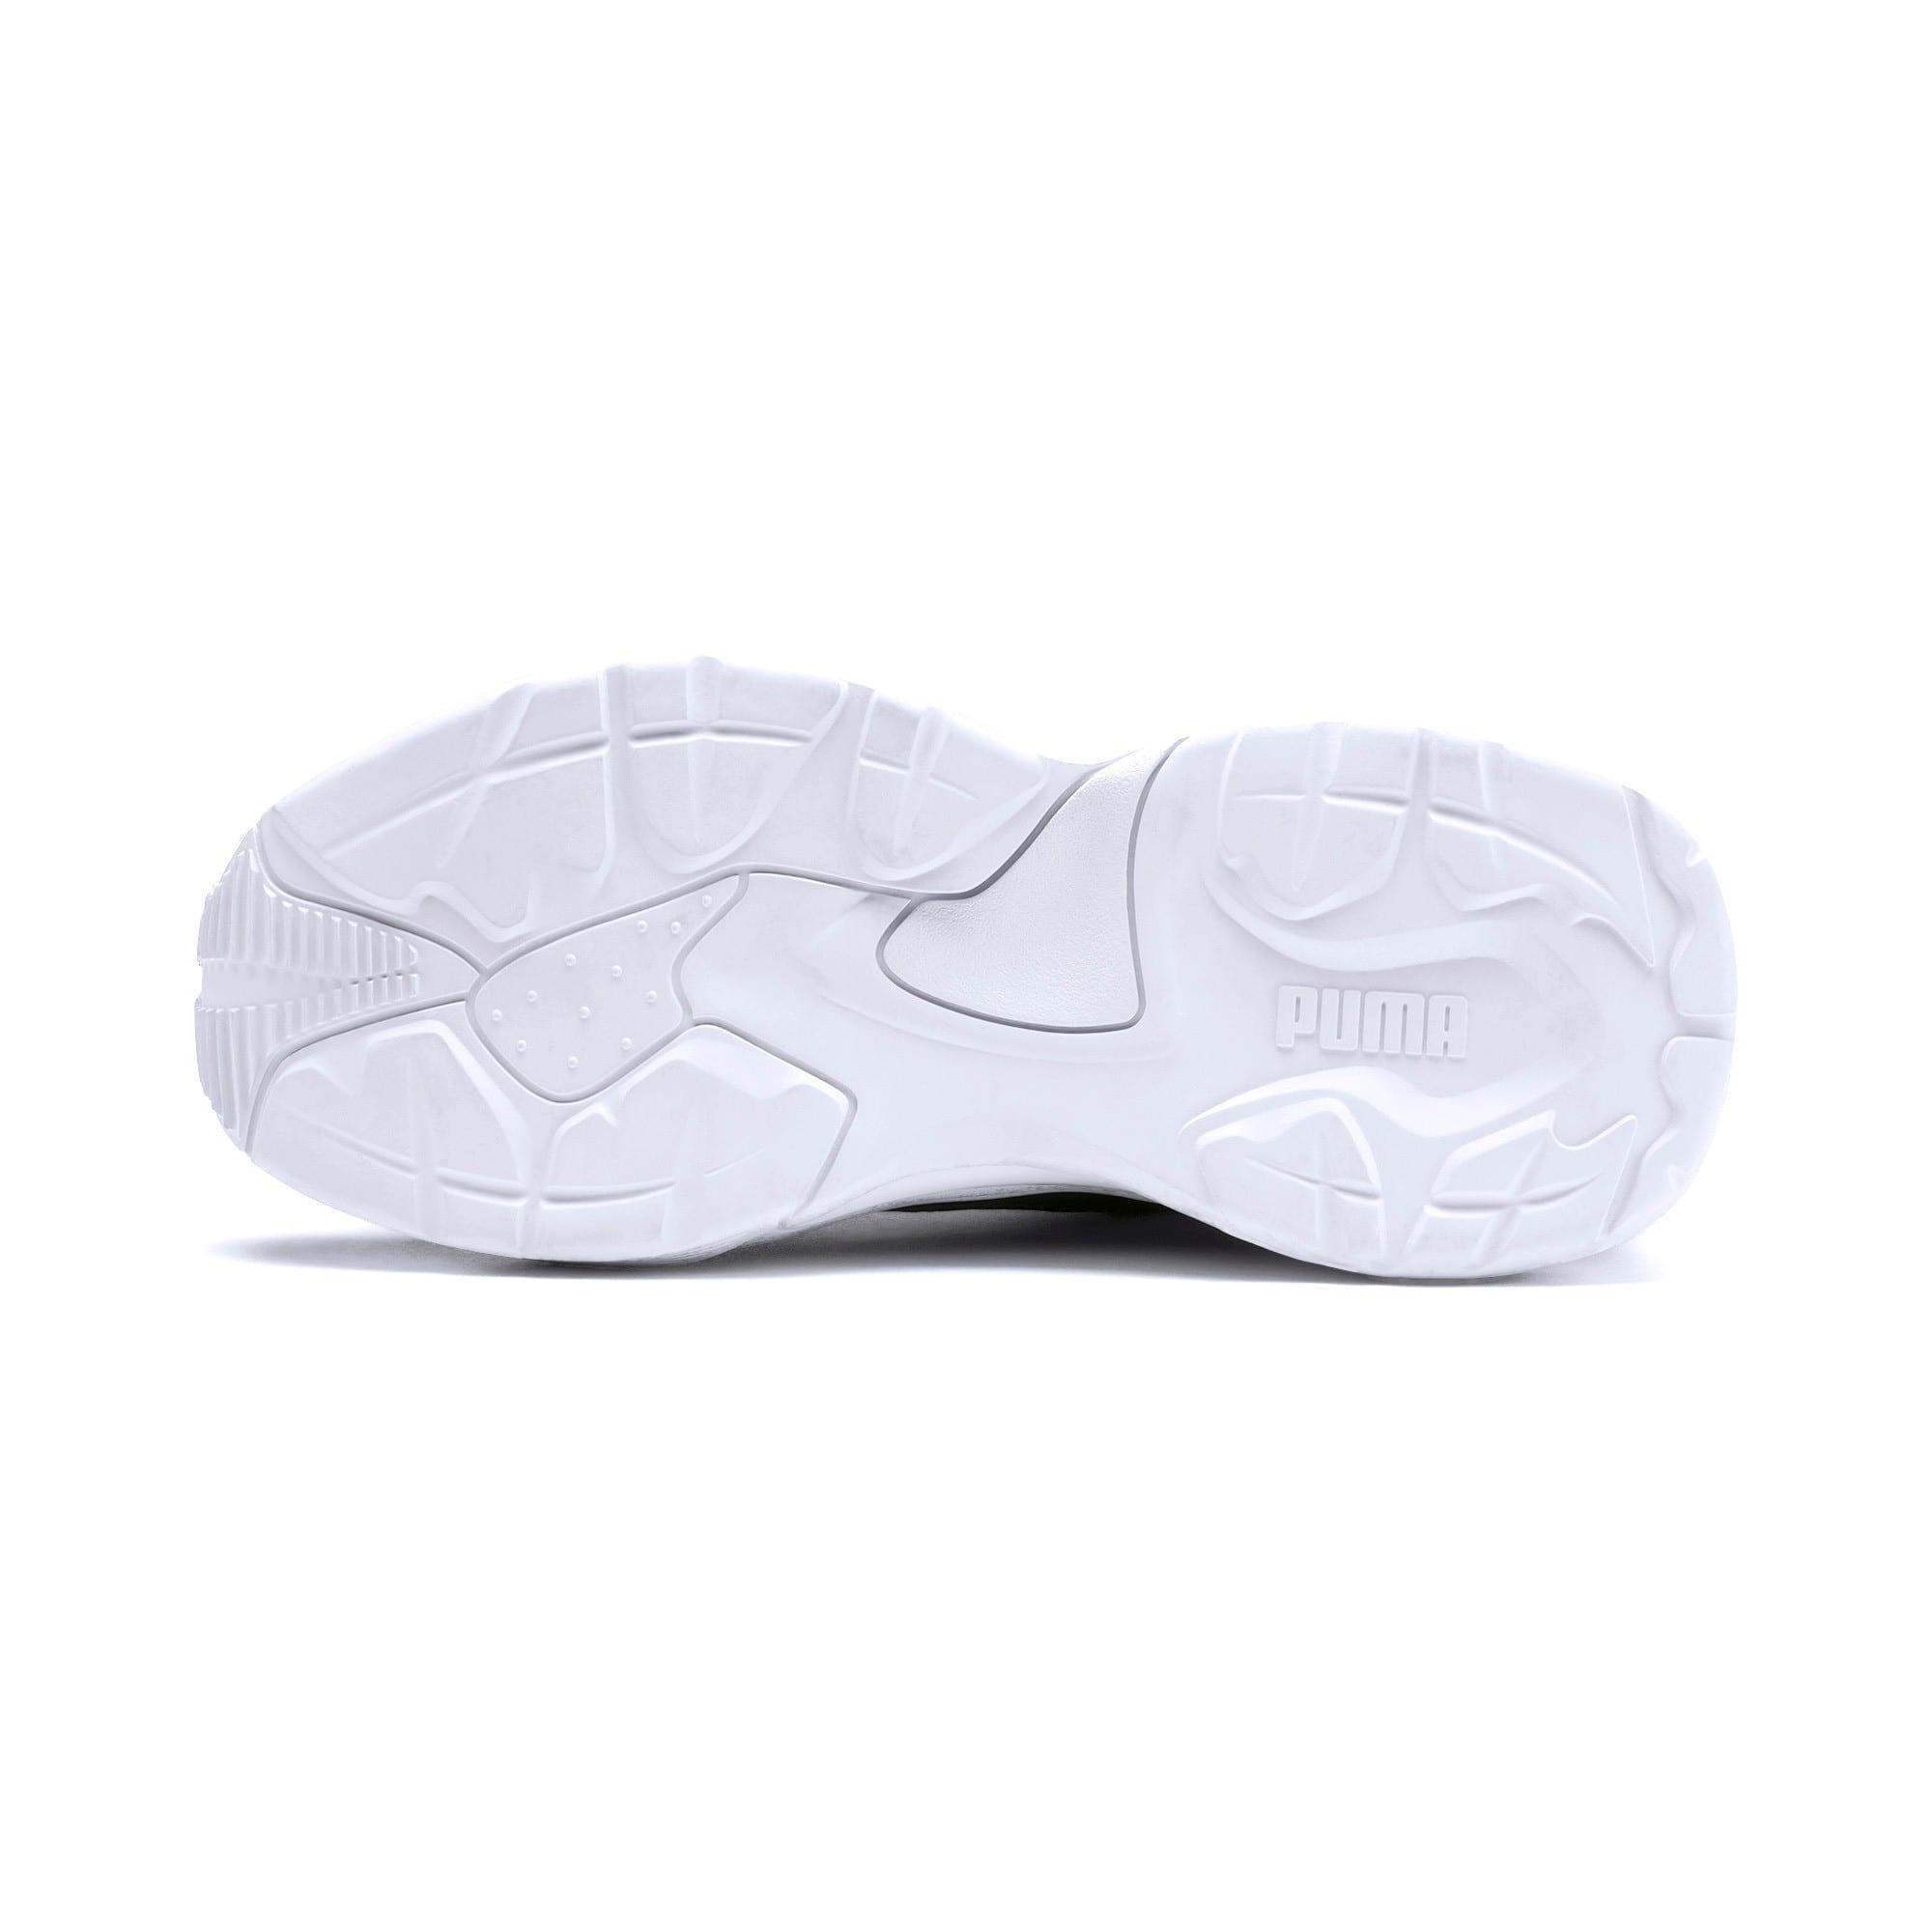 Thumbnail 5 of Thunder Distressed Women's Sneakers, Ebony-Puma Silver, medium